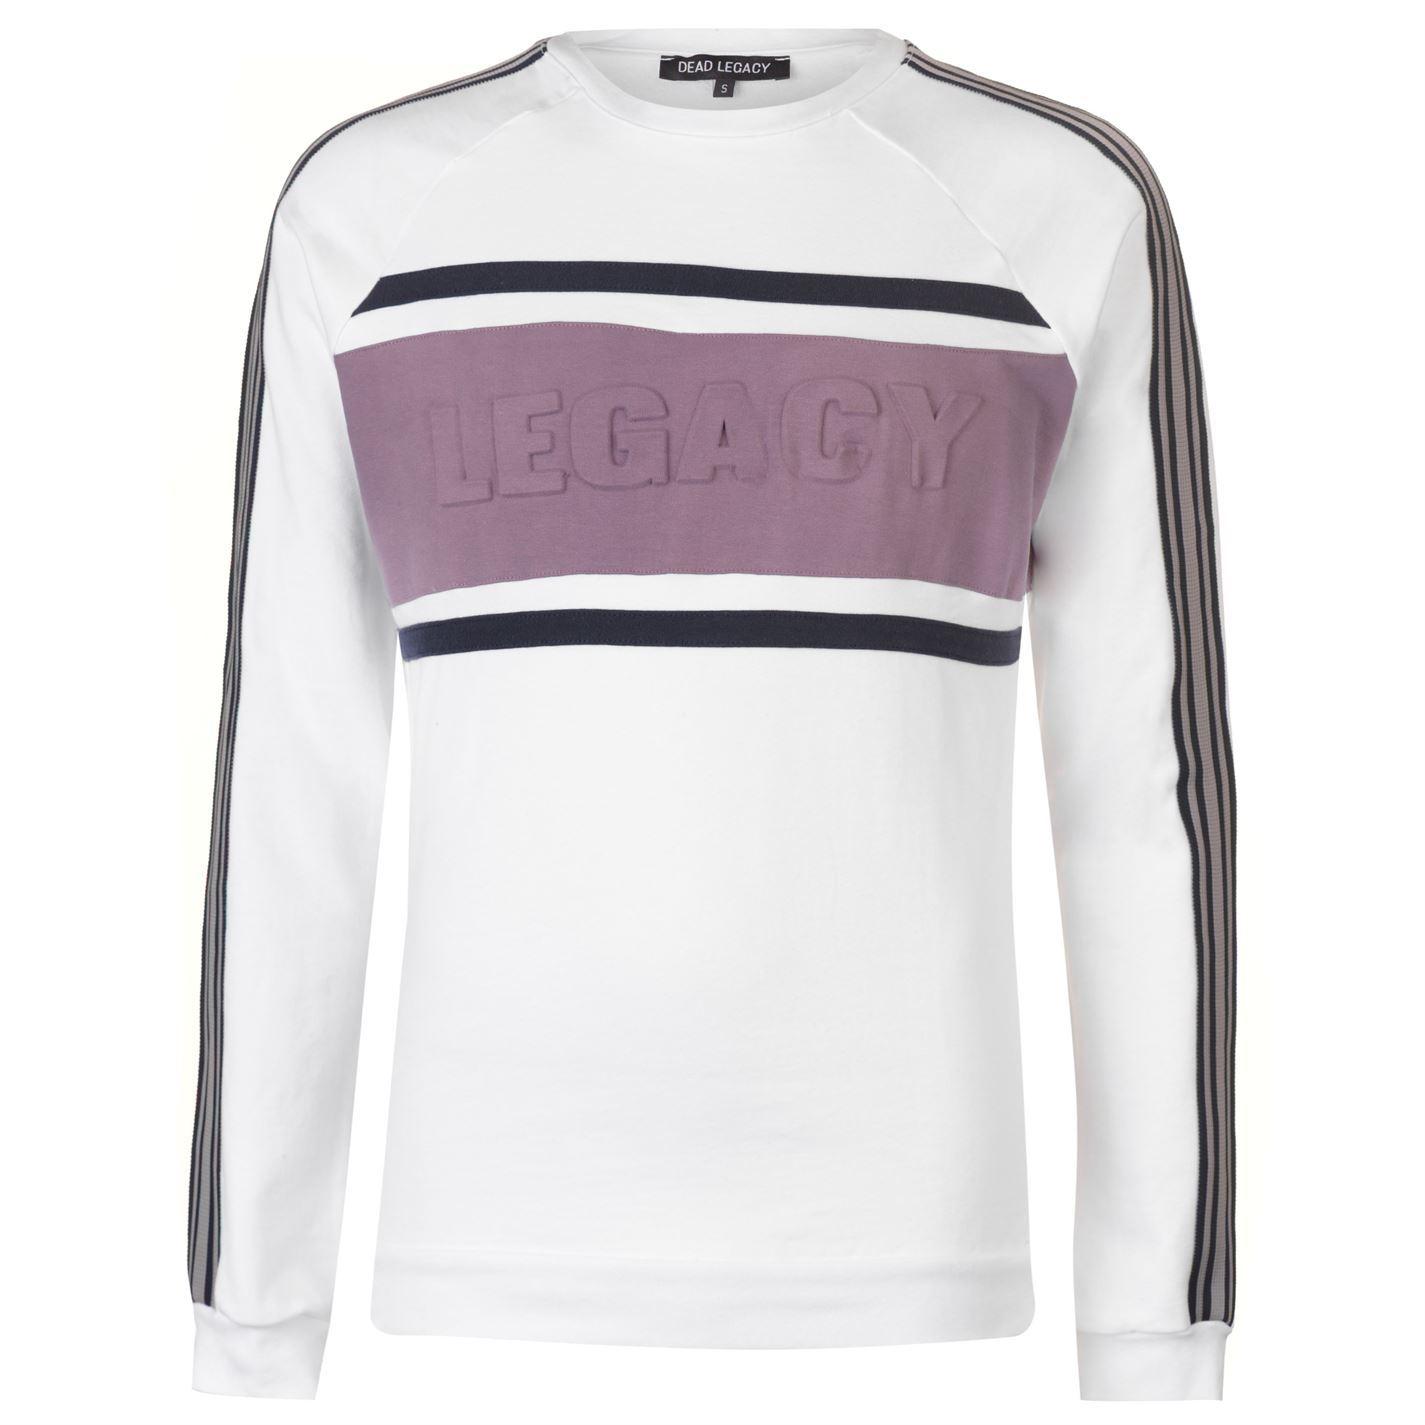 Dead Legacy Uomo Embossed Sweatshirt Uomo Legacy Sweater Top Jumper 9e0ca4